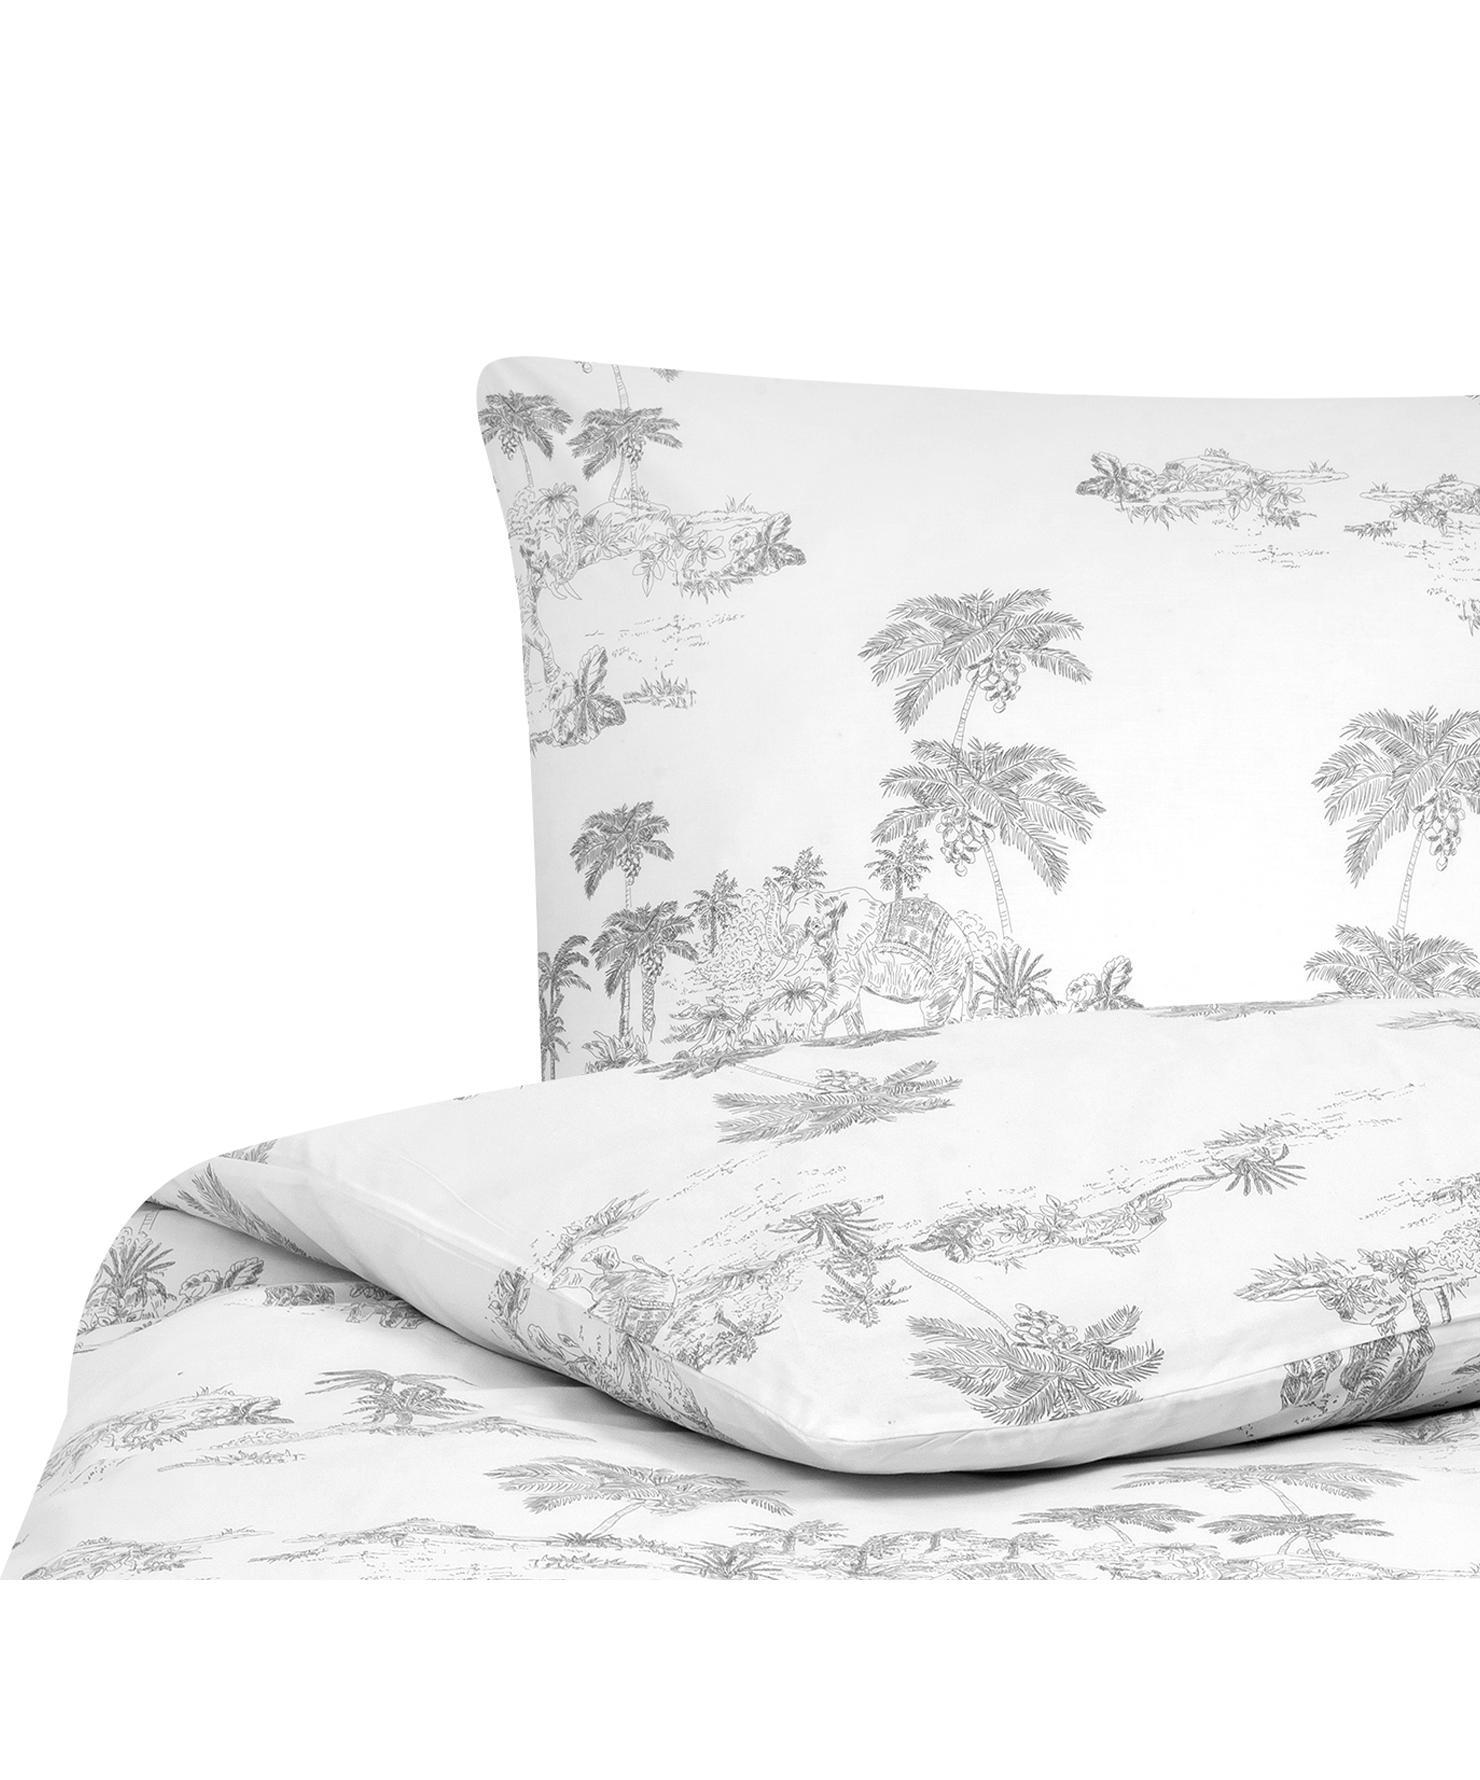 Baumwollperkal-Bettwäsche Bali mit gezeichneten Palemmotiven, Webart: Perkal Fadendichte 180 TC, Weiß, Grau, 135 x 200 cm + 1 Kissen 80 x 80 cm